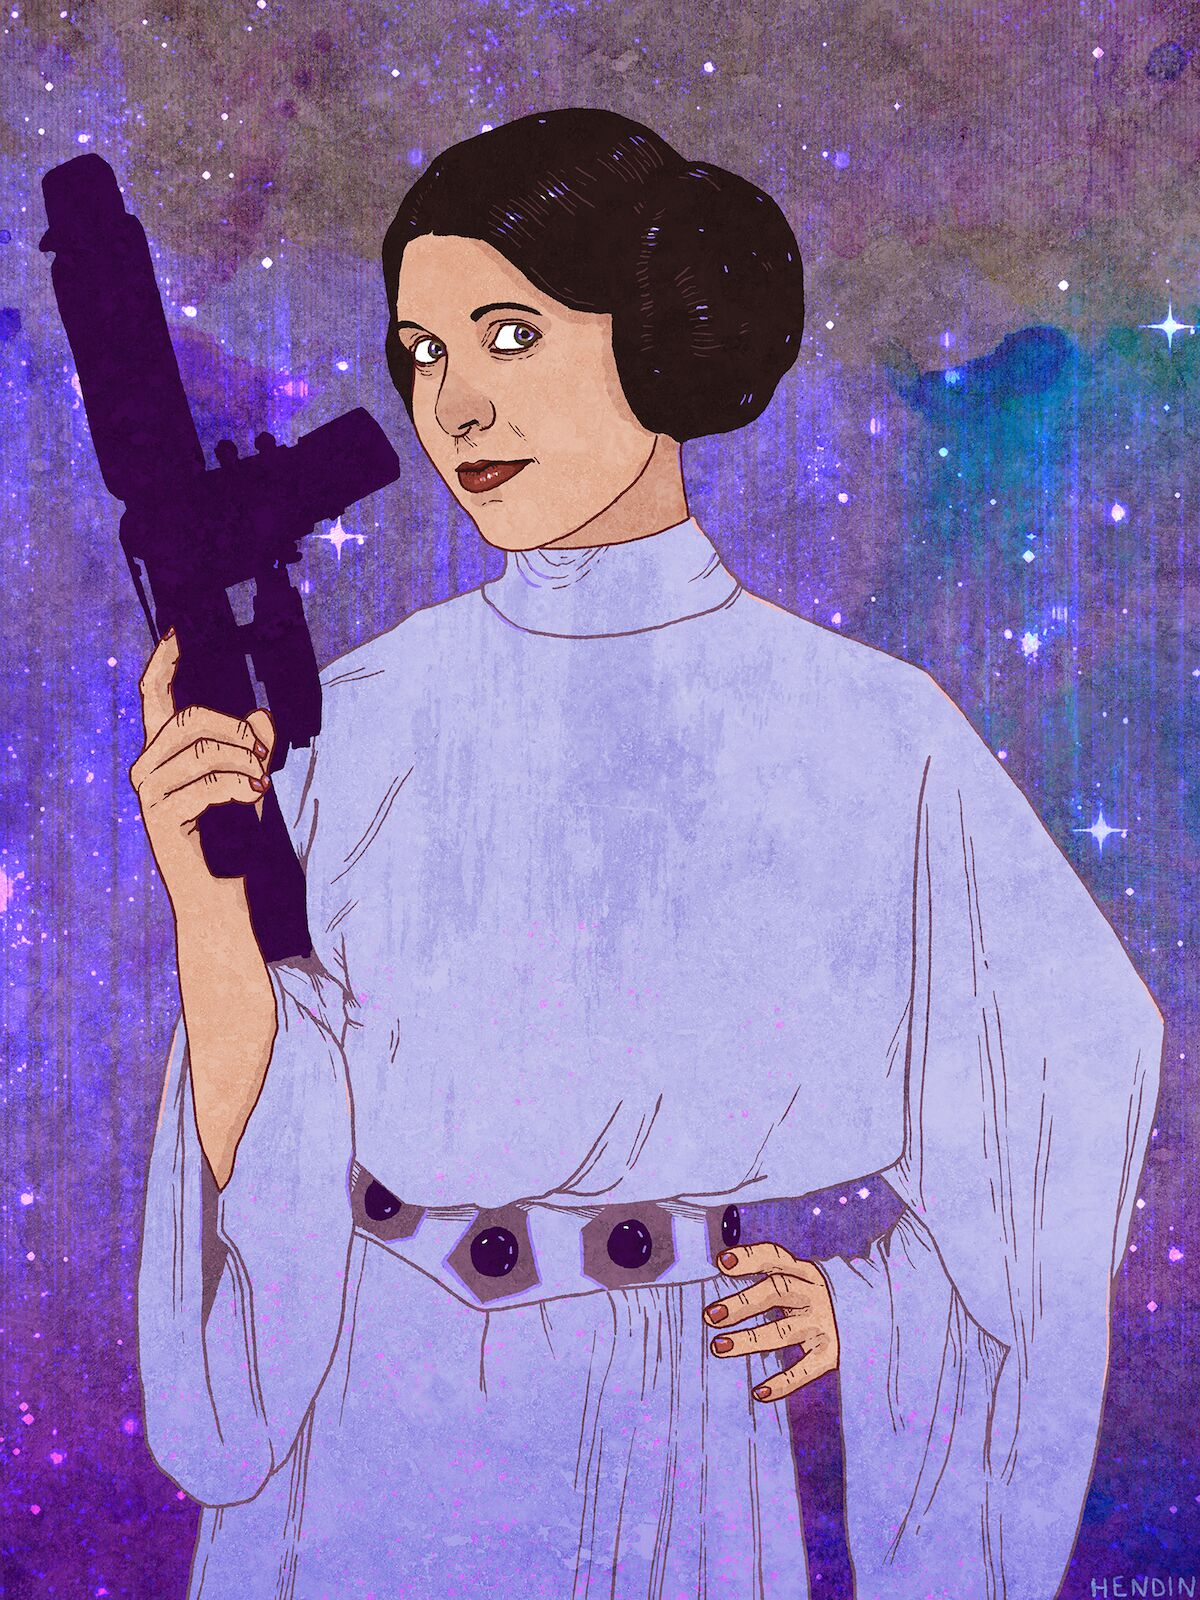 rebecca-hendin-mariam-buzzfeed-illustration-princess-leia-1_preview